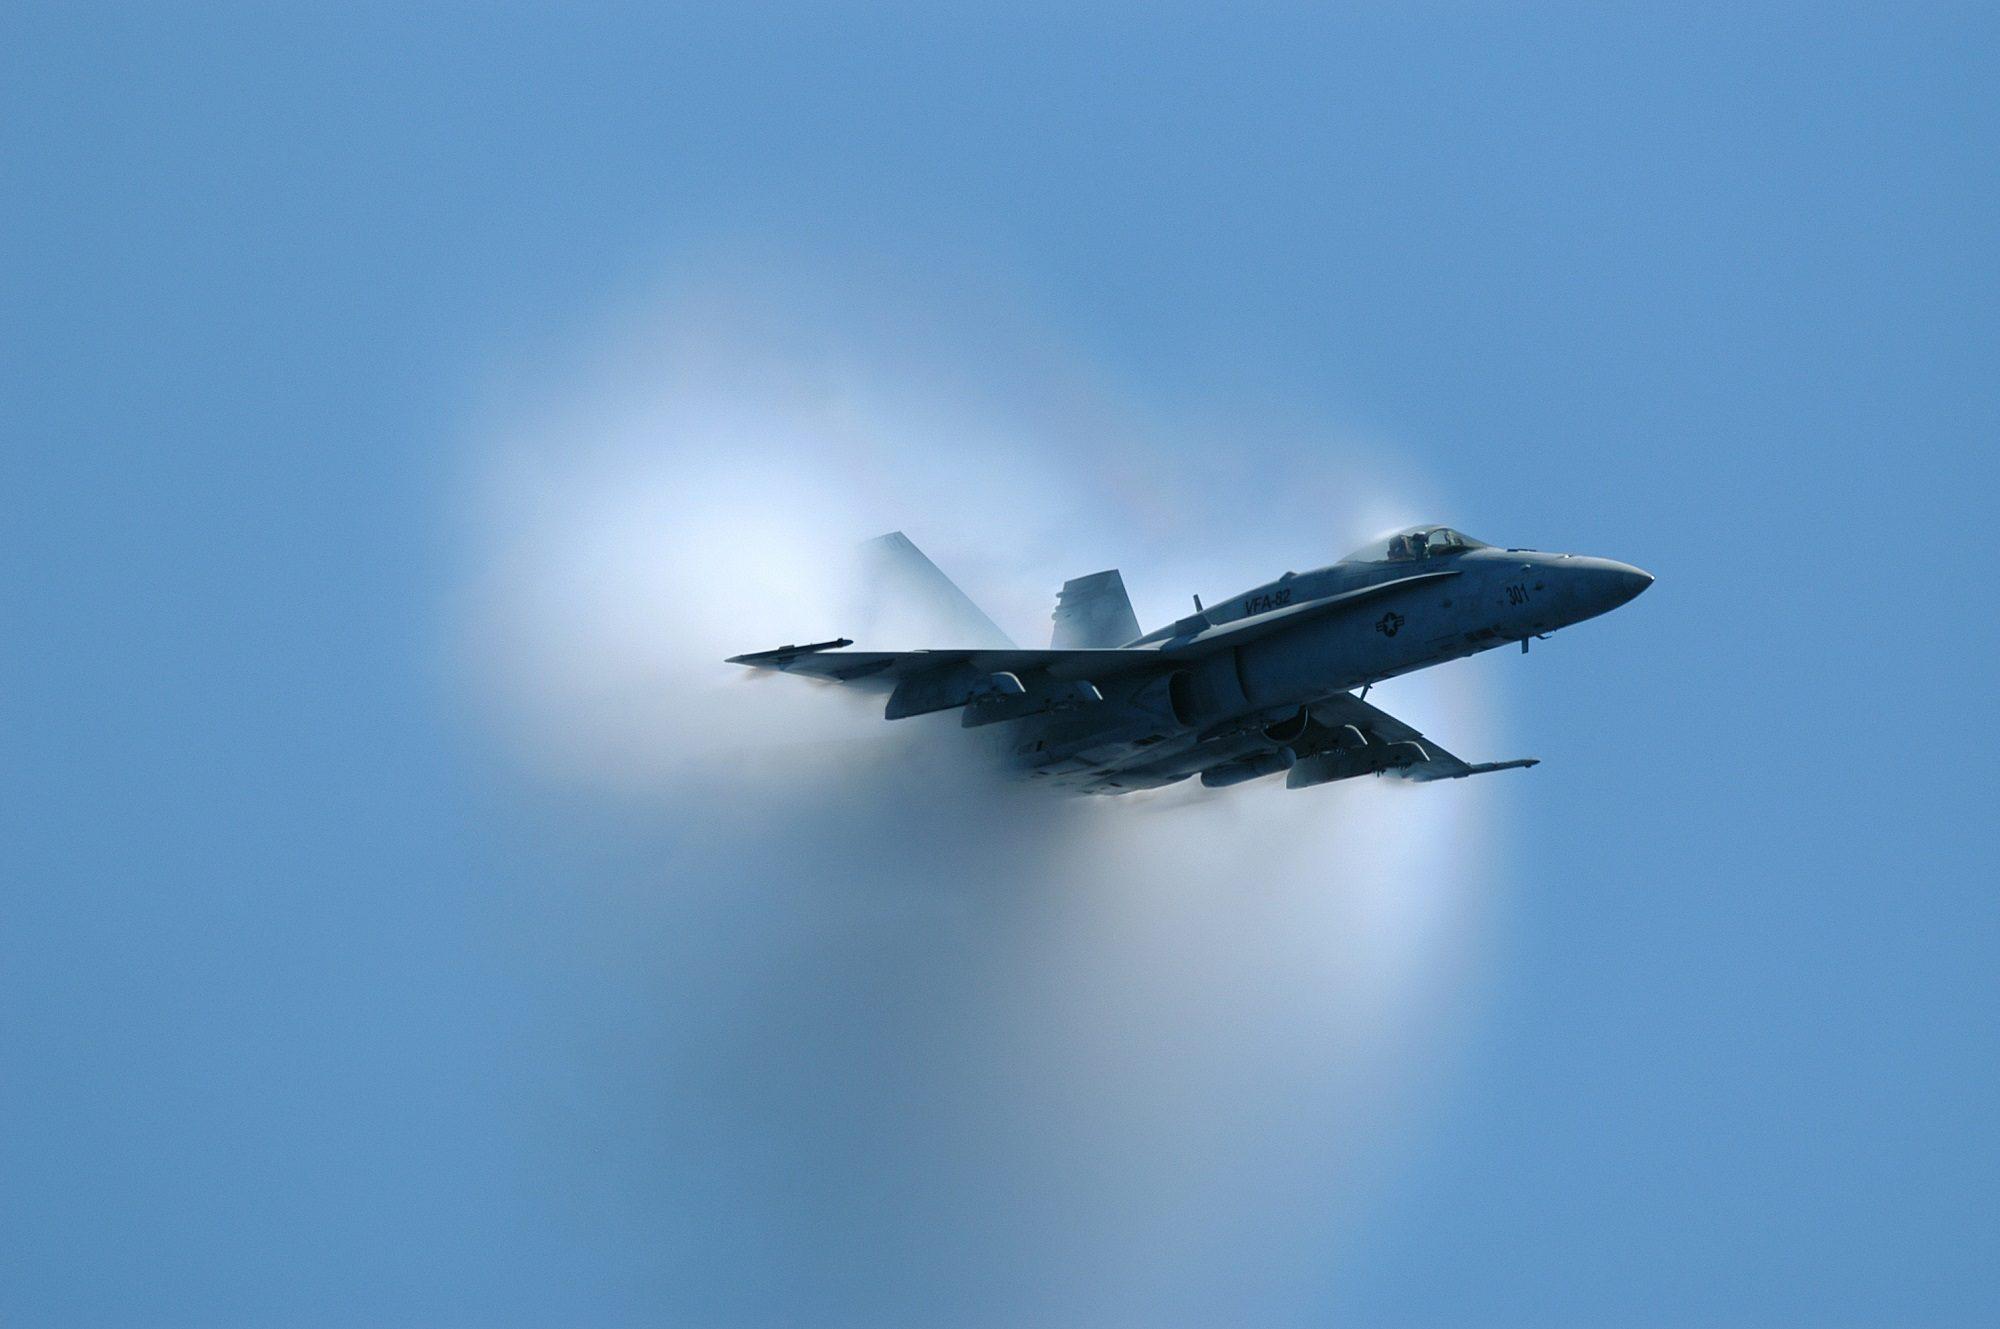 航空機, barrera, 音, 速度, 爆発 - HD の壁紙 - 教授-falken.com